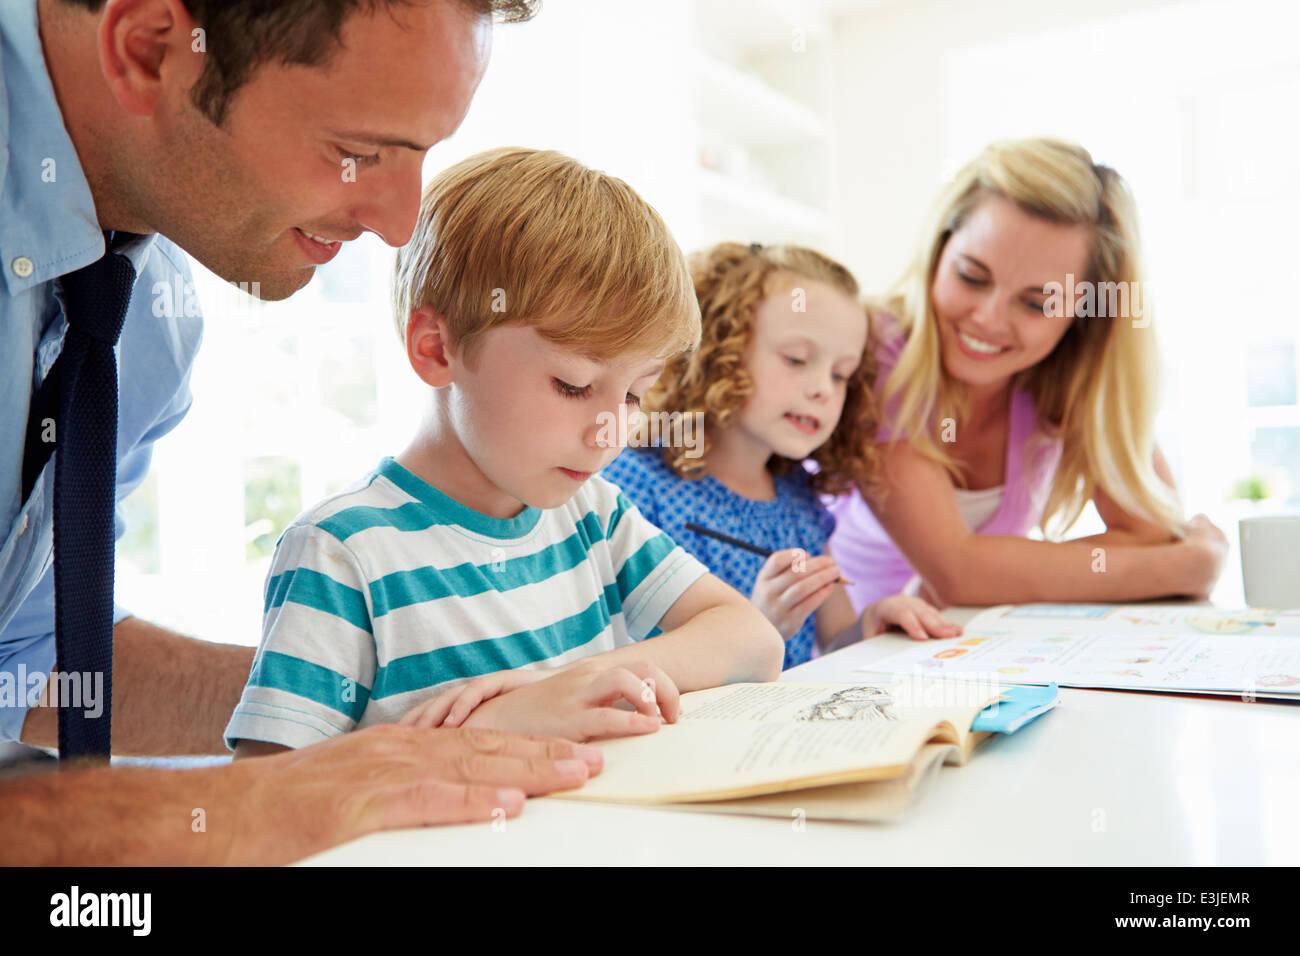 Parents Helping Children With Homework In Kitchen - Stock Image